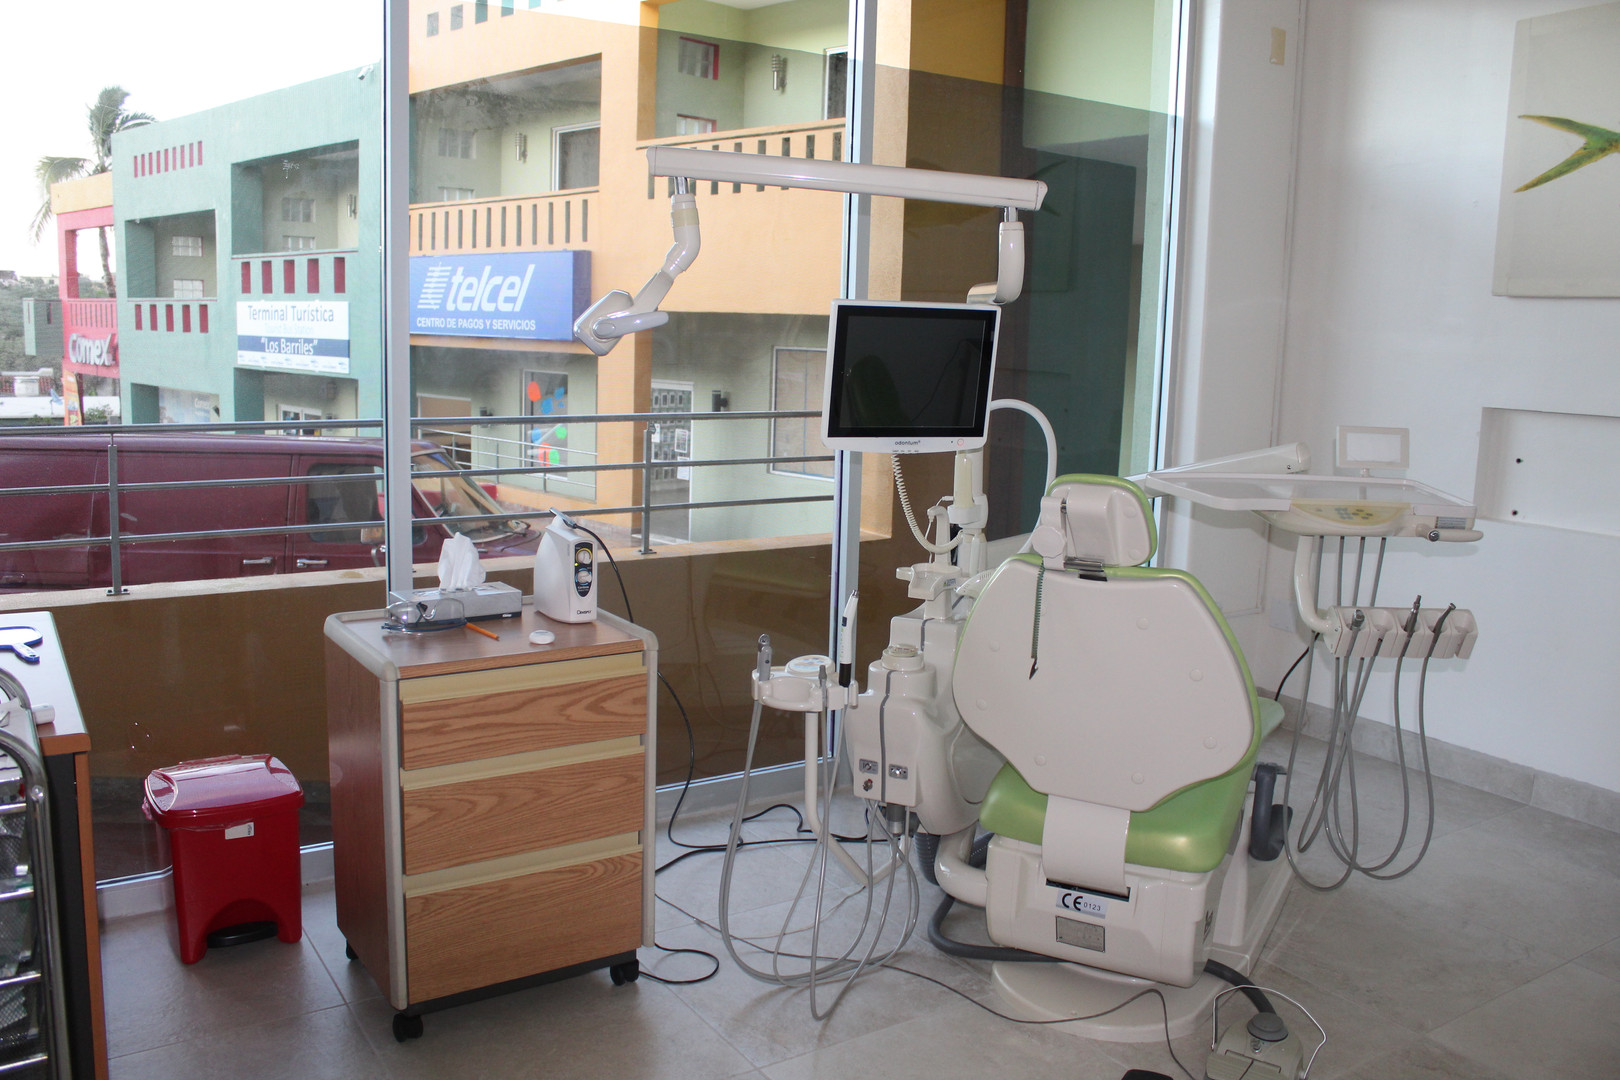 Dr. Samir Ganelon's dental room